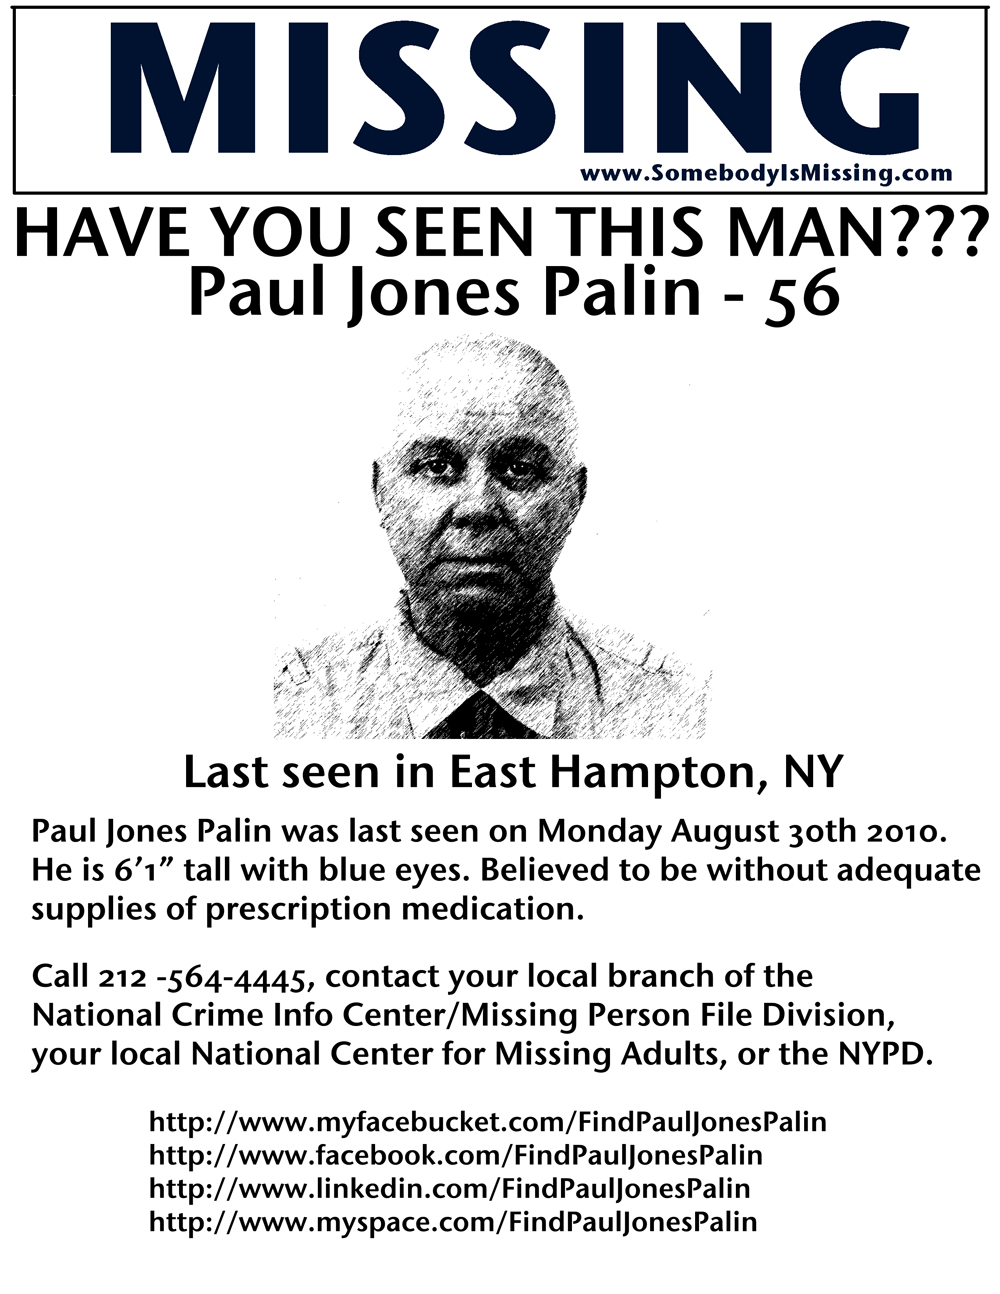 PJ-Palin-Flier-Bald